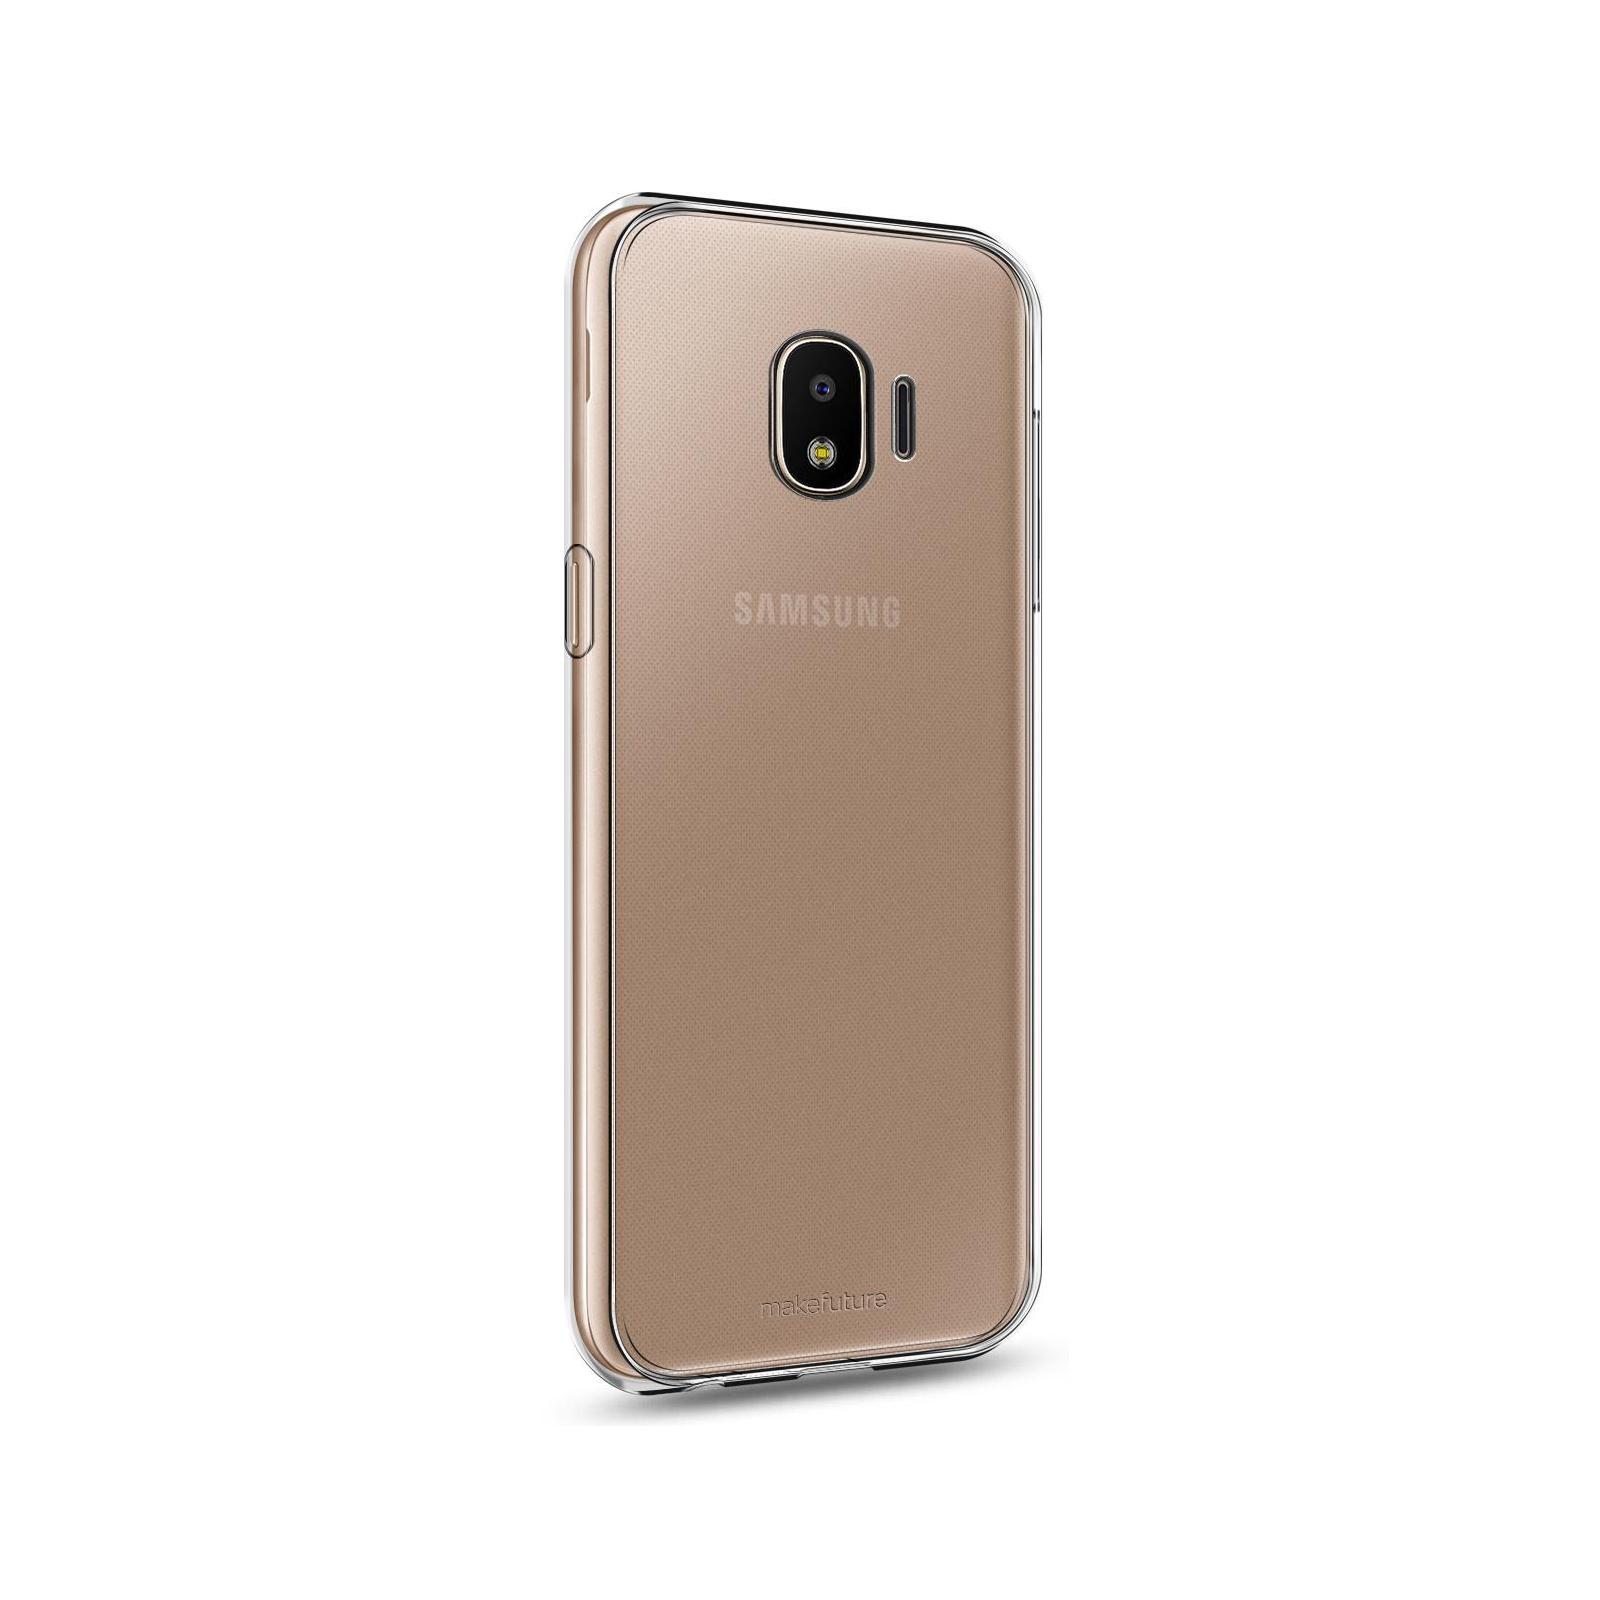 Чехол для моб. телефона MakeFuture Air Case (TPU) Samsung J2 Core Clear (MCA-SJ260CL) изображение 2